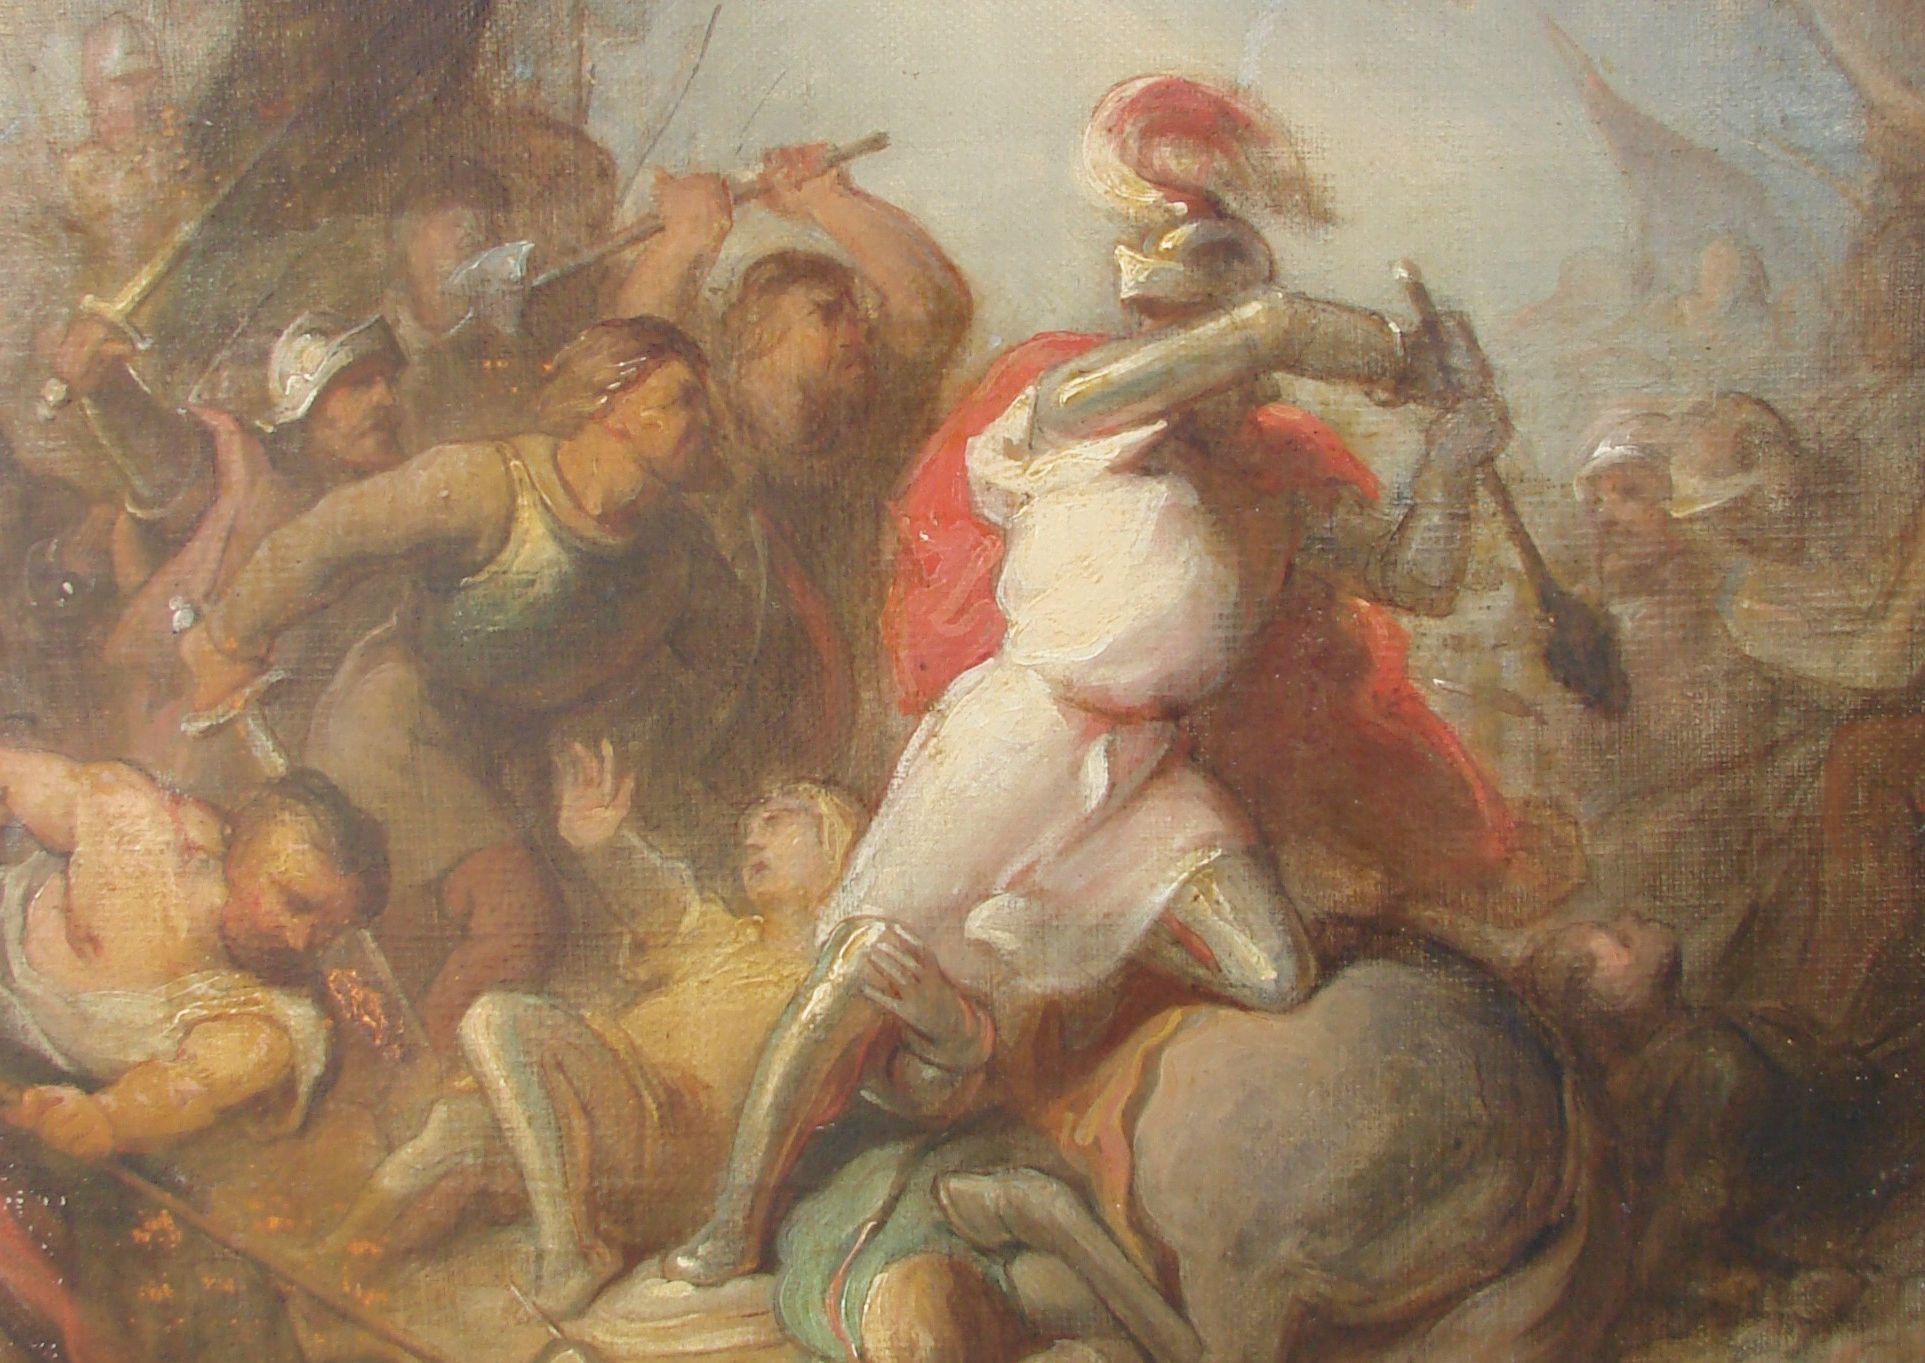 Slag bij Ane door Anton Frederik von Zurcher_bron Historisch Cultureel Info Centrum Vechtdal te Gramsbergen